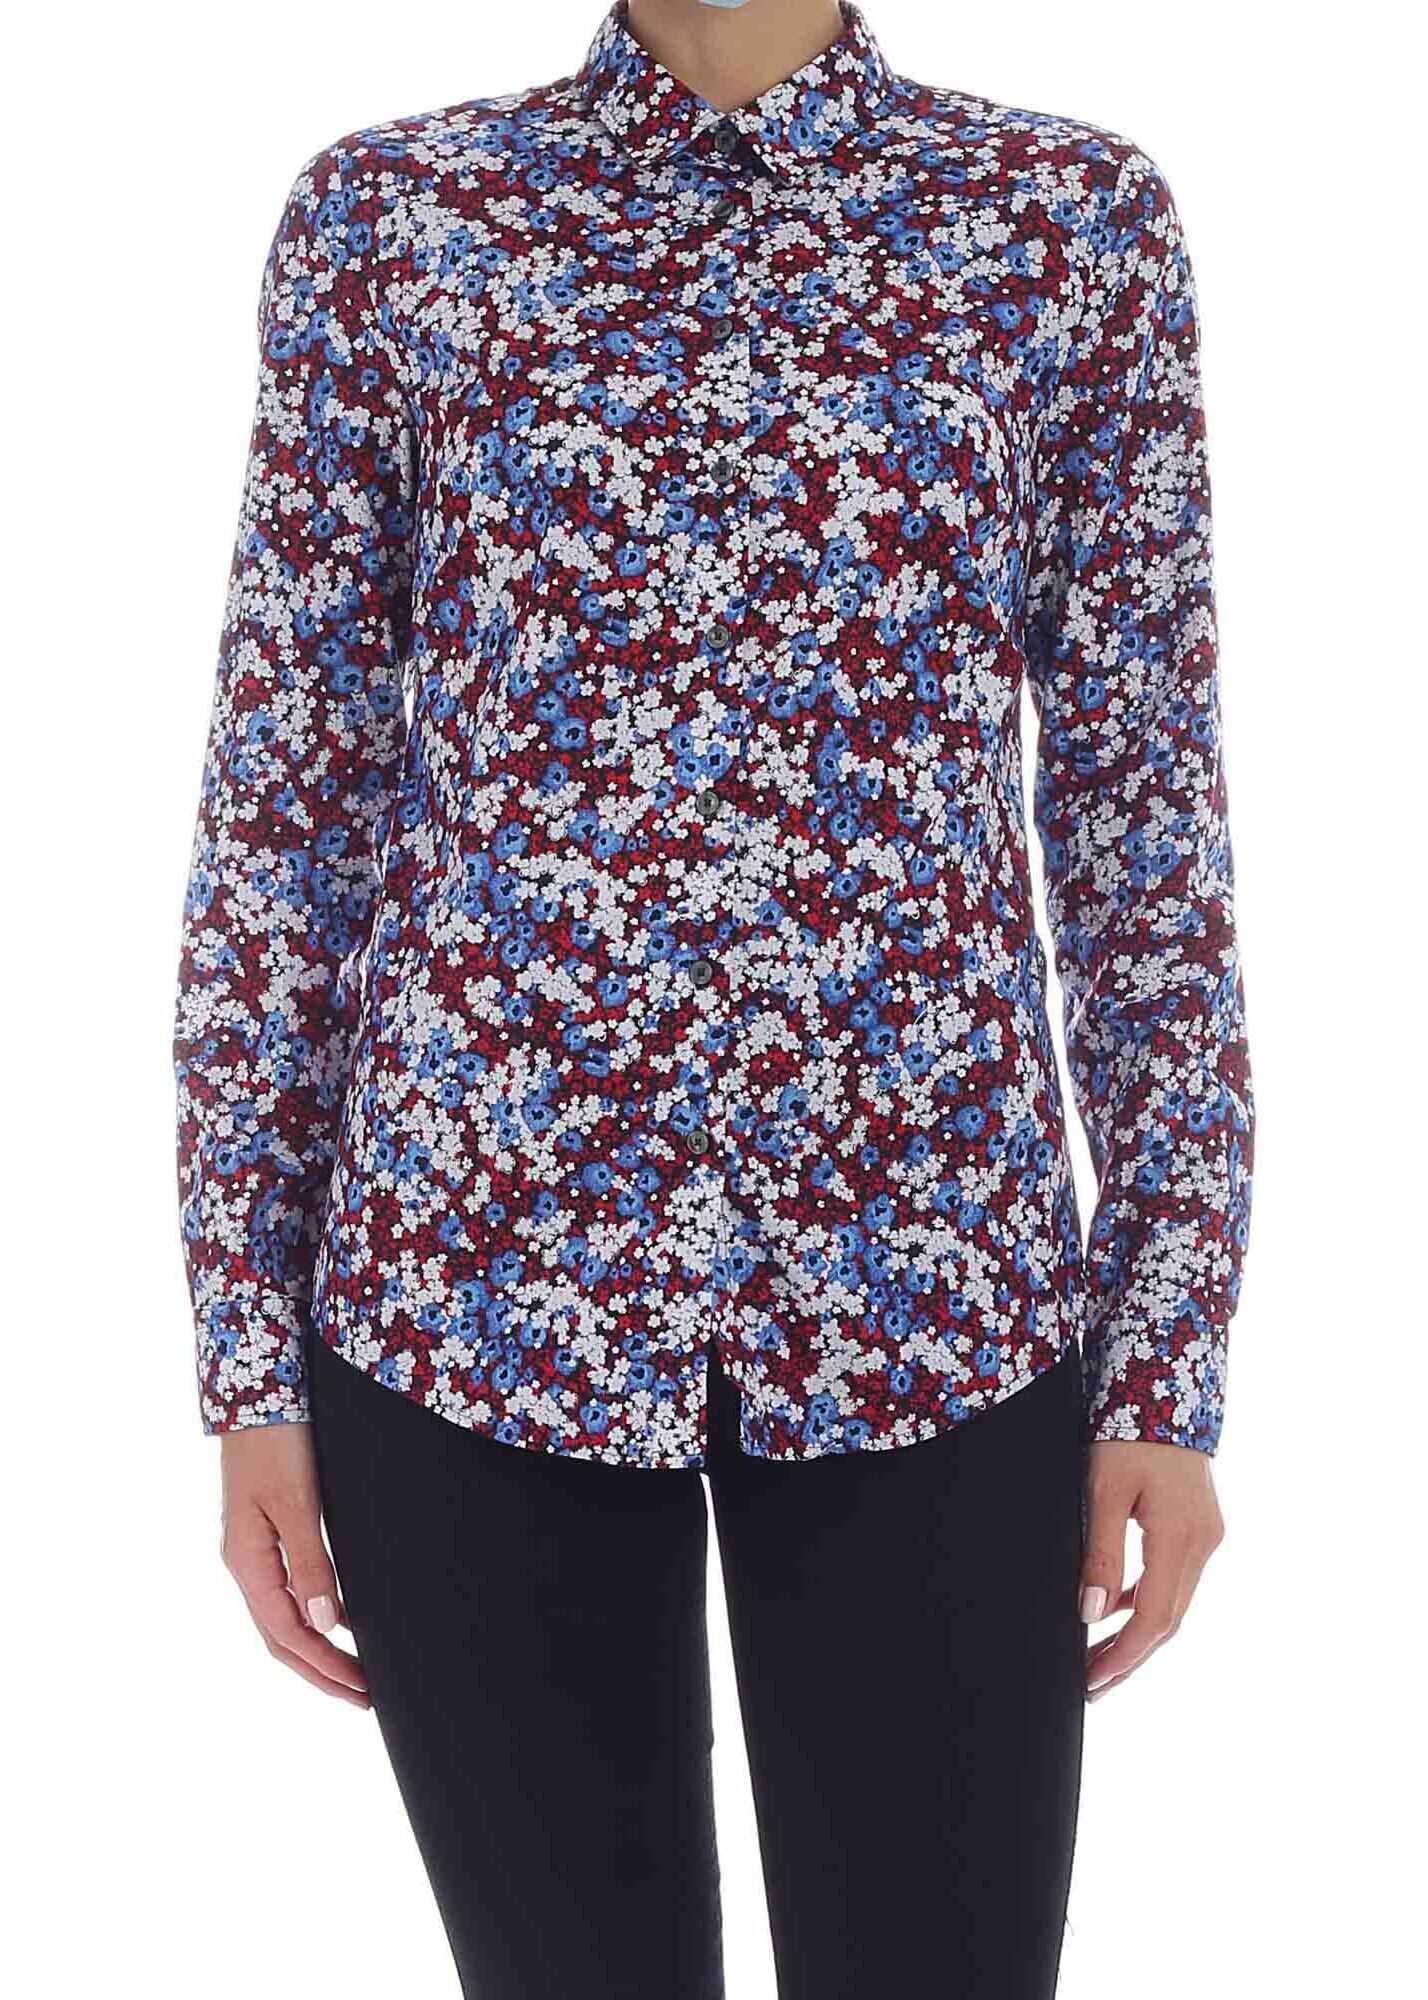 Tommy Hilfiger Kimberley Mutlicolor Shirt Multi